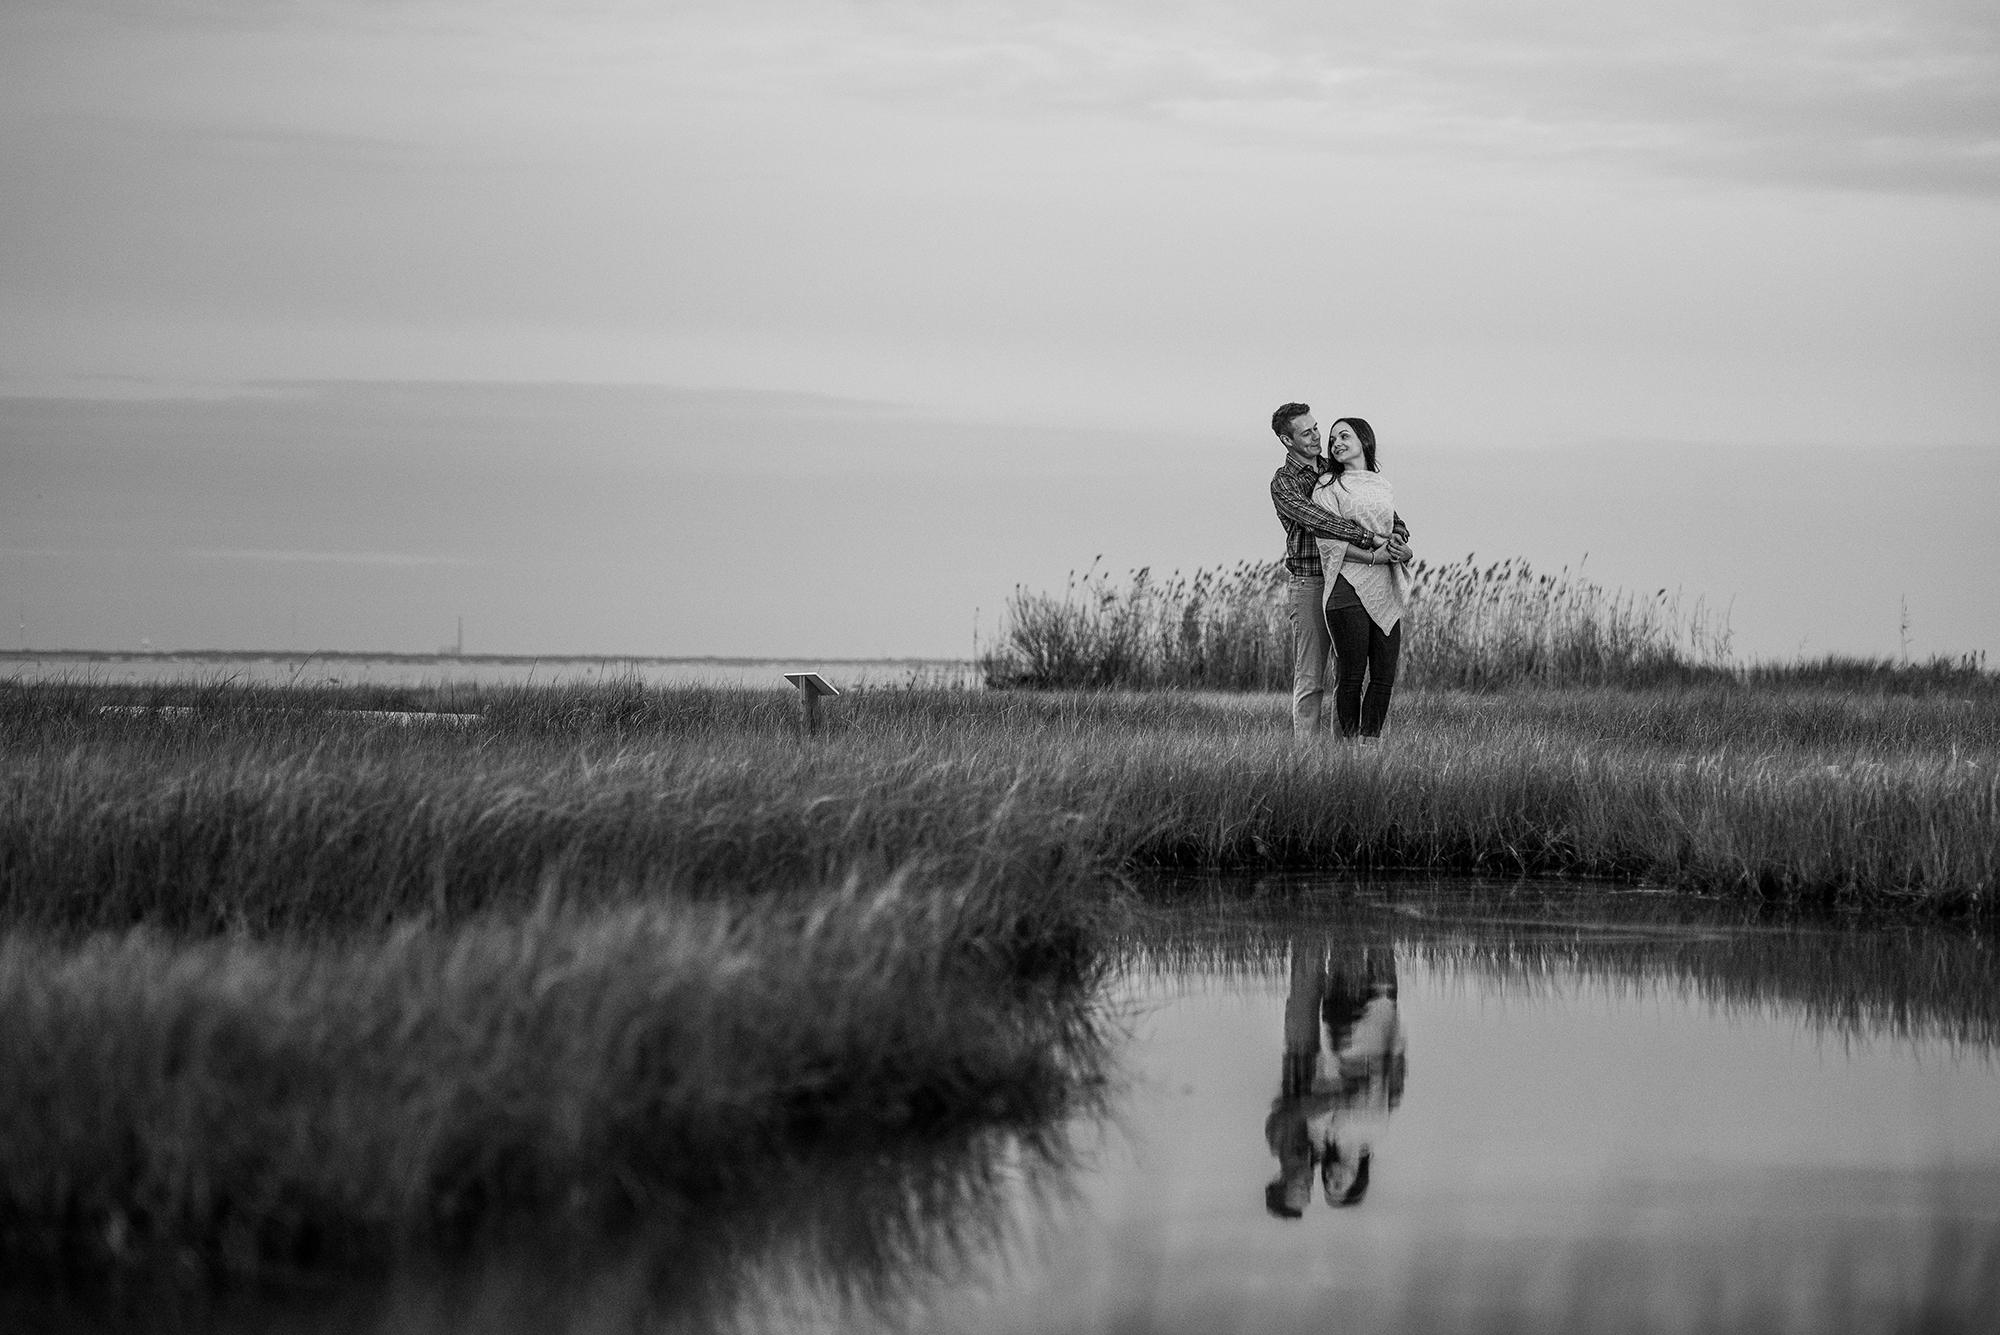 LBI Foundation of Arts Engagement Photographer